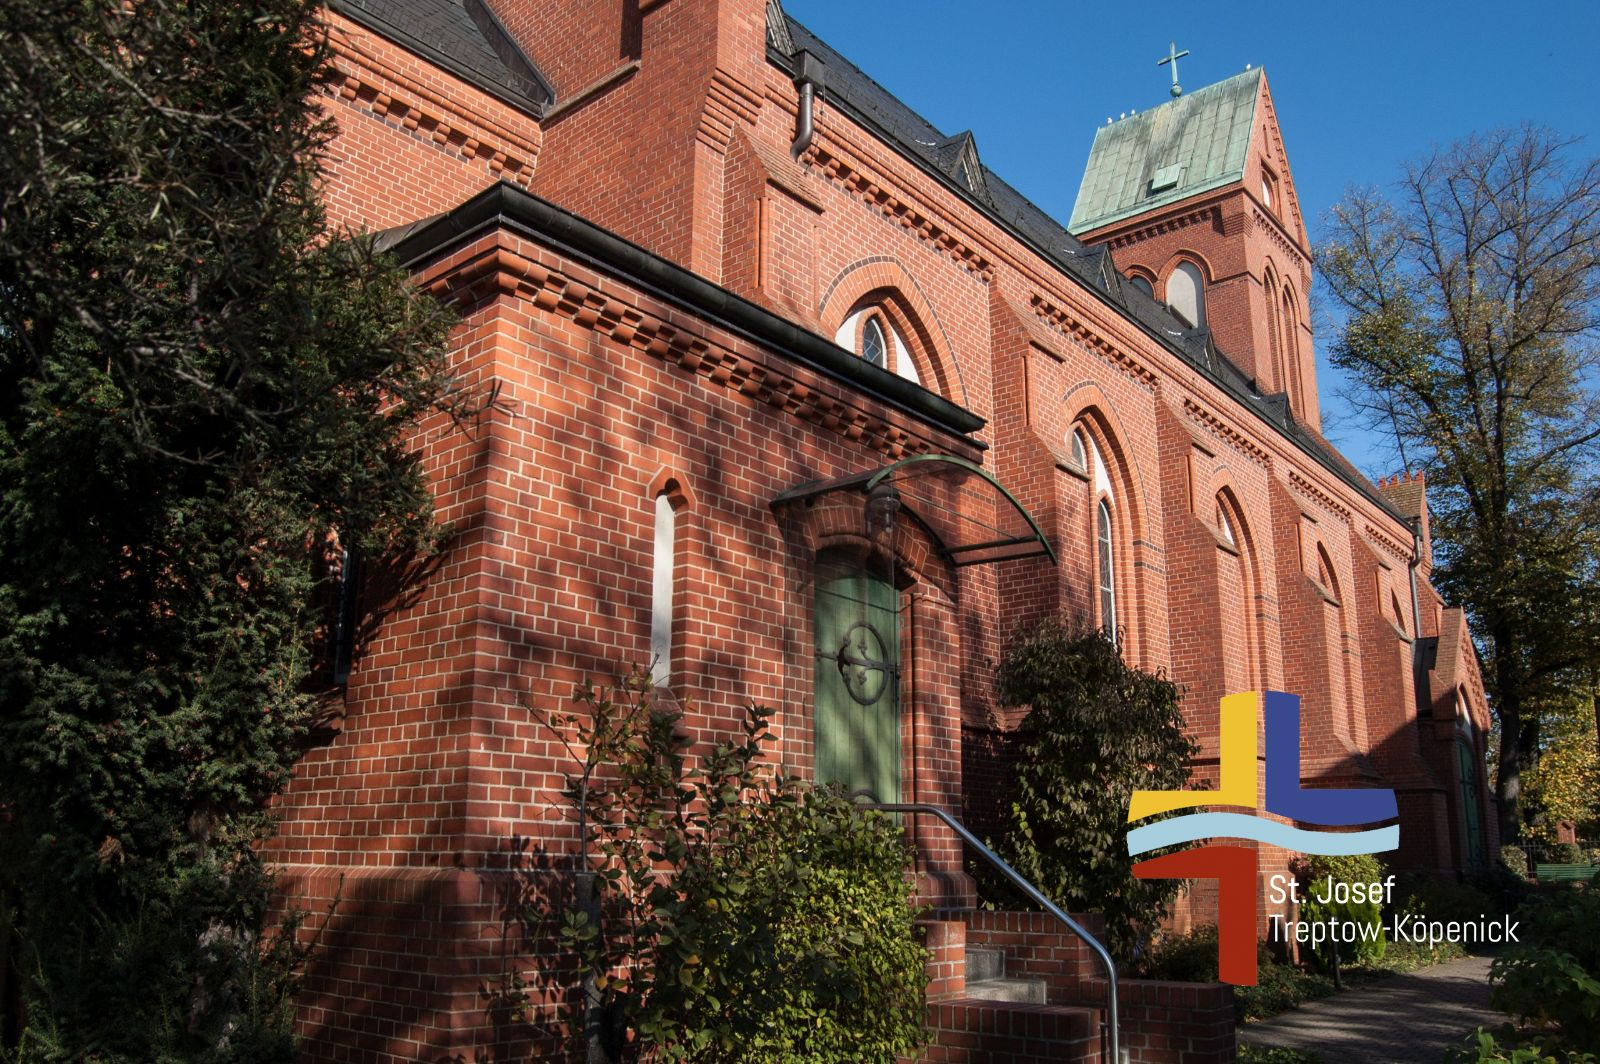 Freitag, 1. Mai 2020: Heilige Messe im Livestream um 10:00 Uhr